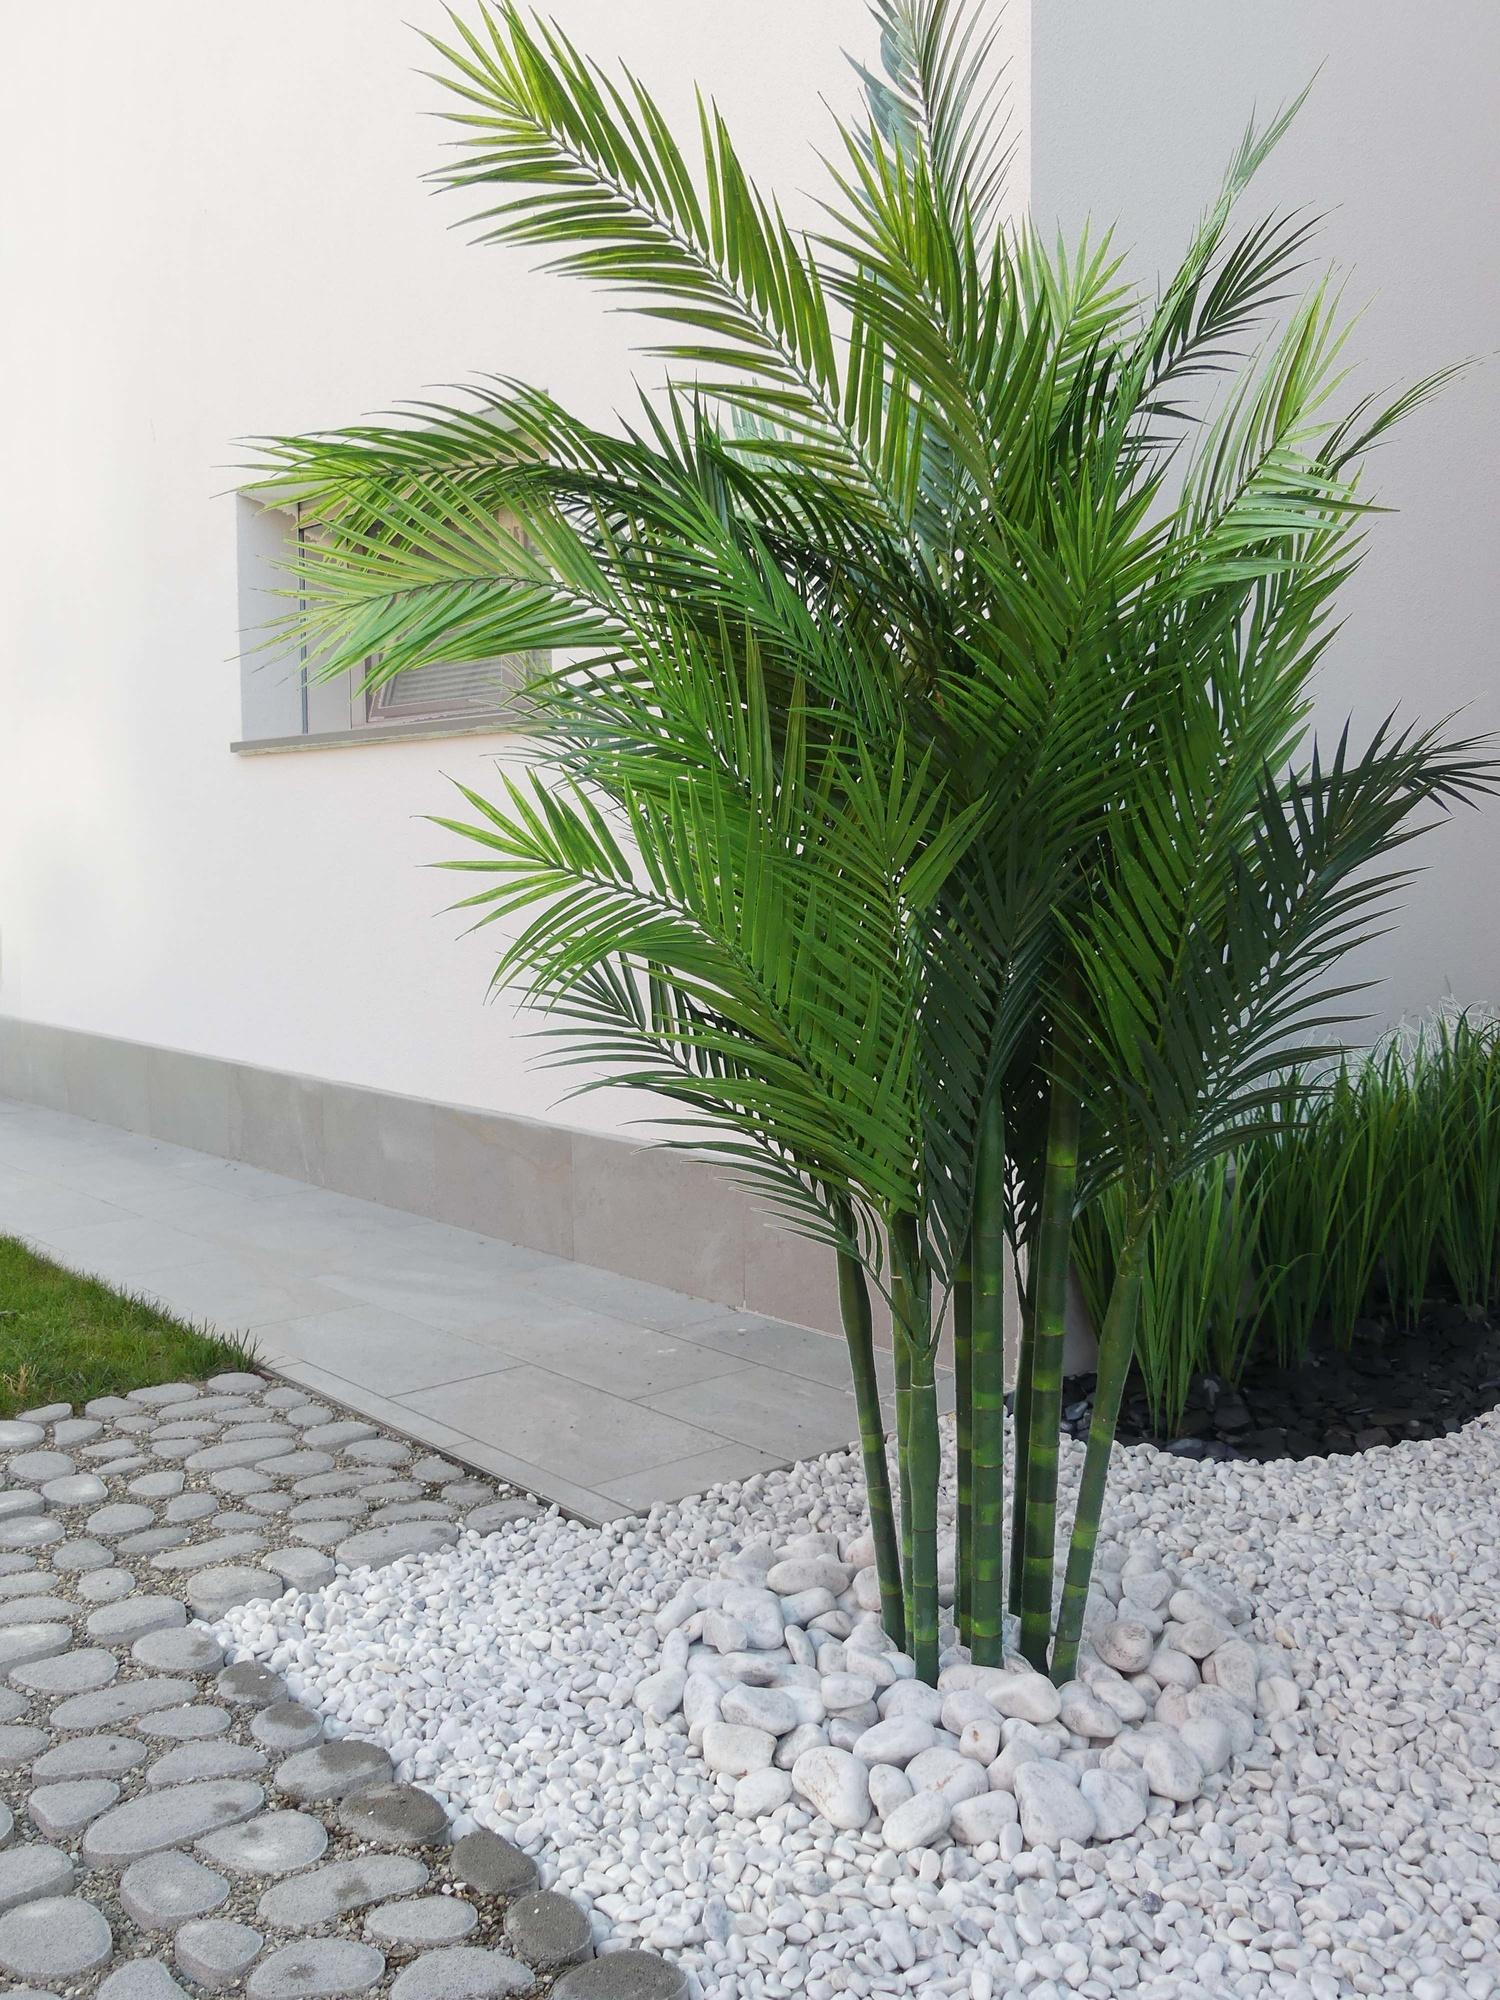 Areca Palm | Piante Artificiali da esterno/interno | Viridium